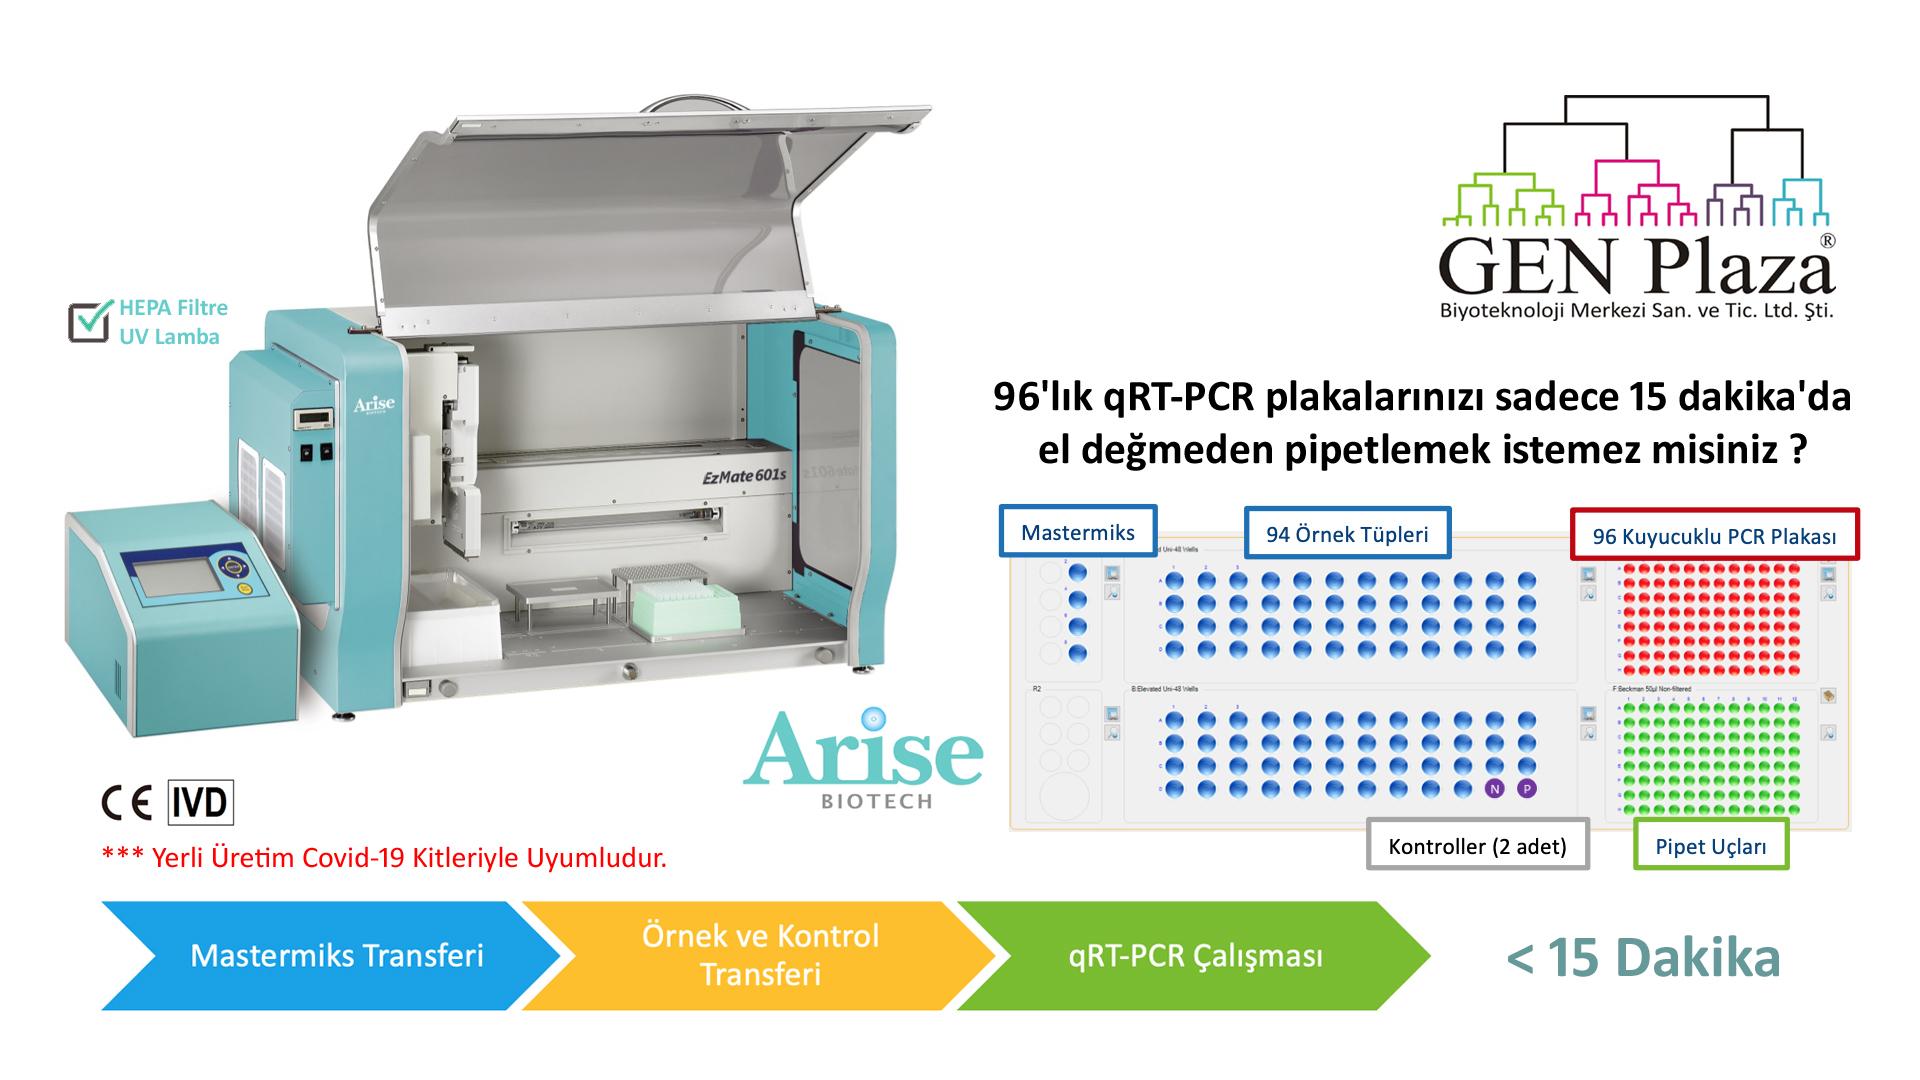 genplaza, gen plaza, biotech, biotechnology, biyoteknoloji, GEN, genplaza, destek, arise, qpcr, pcr, qRT-PCR, covid19, covid-19, sars cov2, Arise, arise, arise biotech, biotech, pipette, pipet, otomatik pipet, automated pipetting, pipetting, pipetleme sistemi, otomatik pipetleme sistemi, ce, ivd